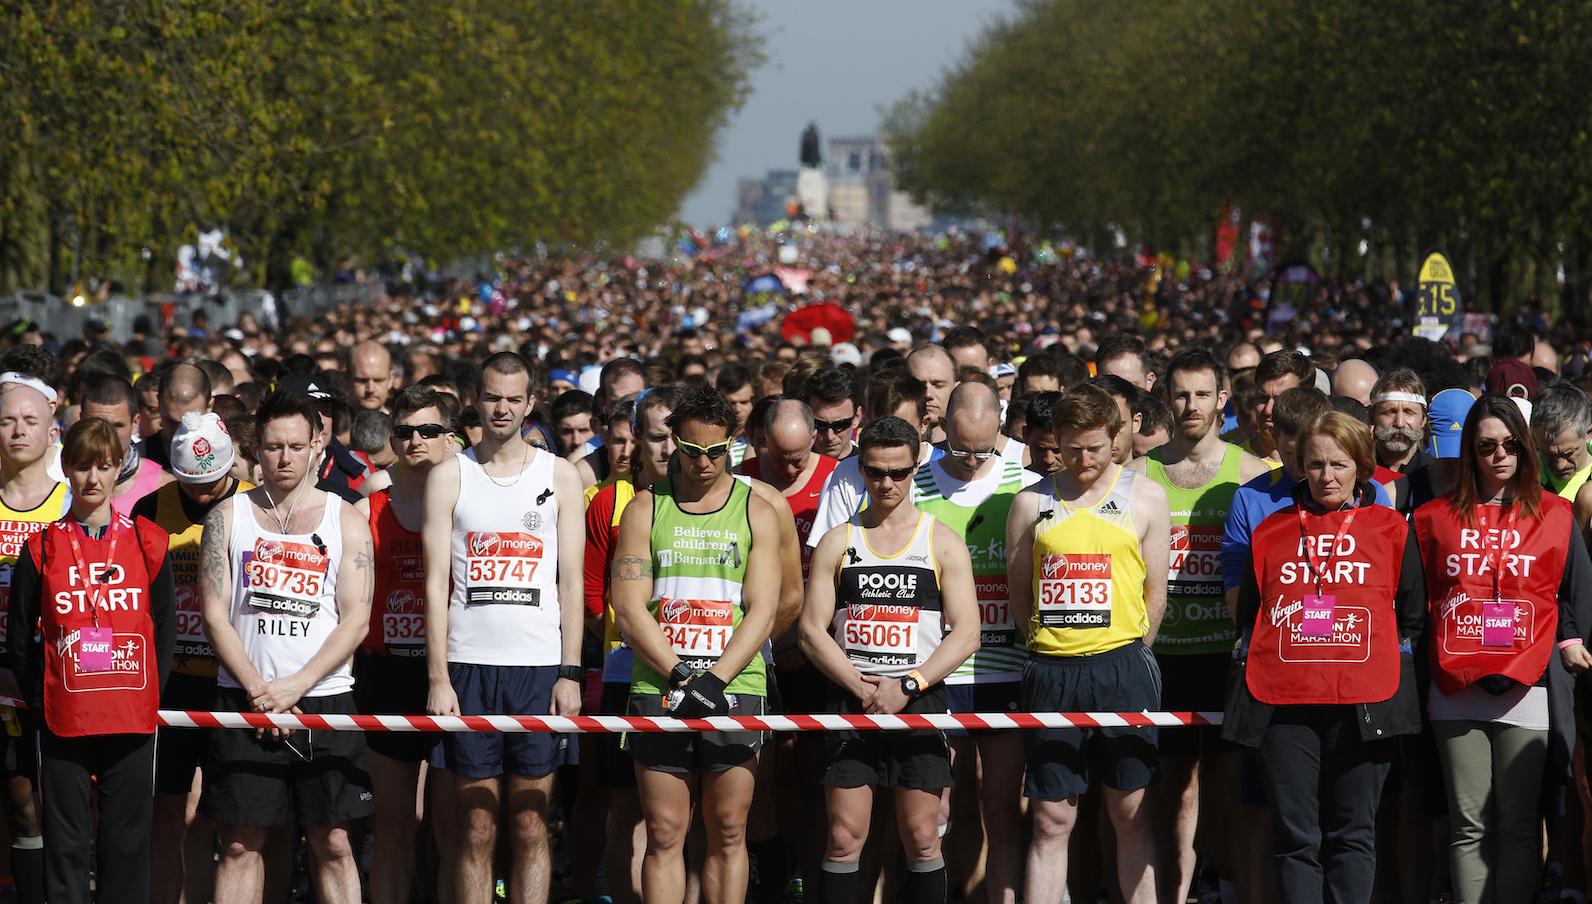 Fitness over 50 mailbox marathon